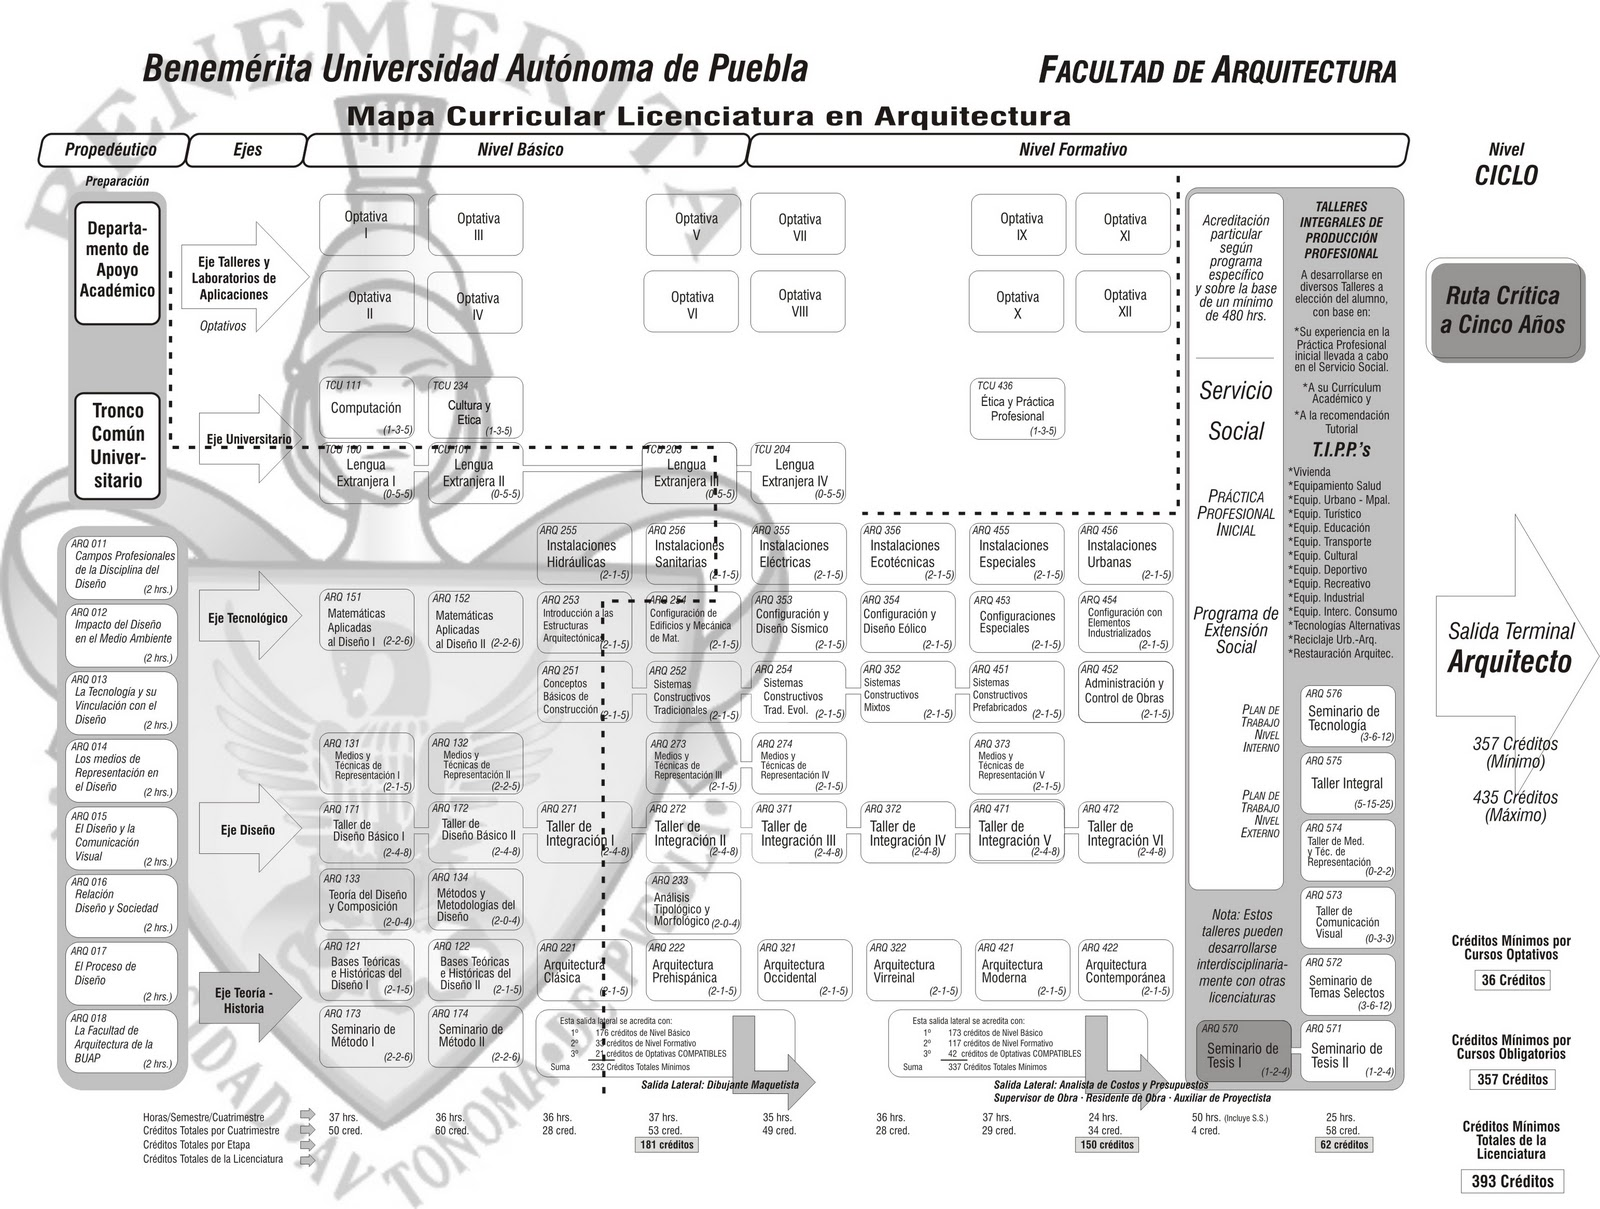 Arquitectura buap tehuacan t c u plan f nix for Mapa facultad de arquitectura